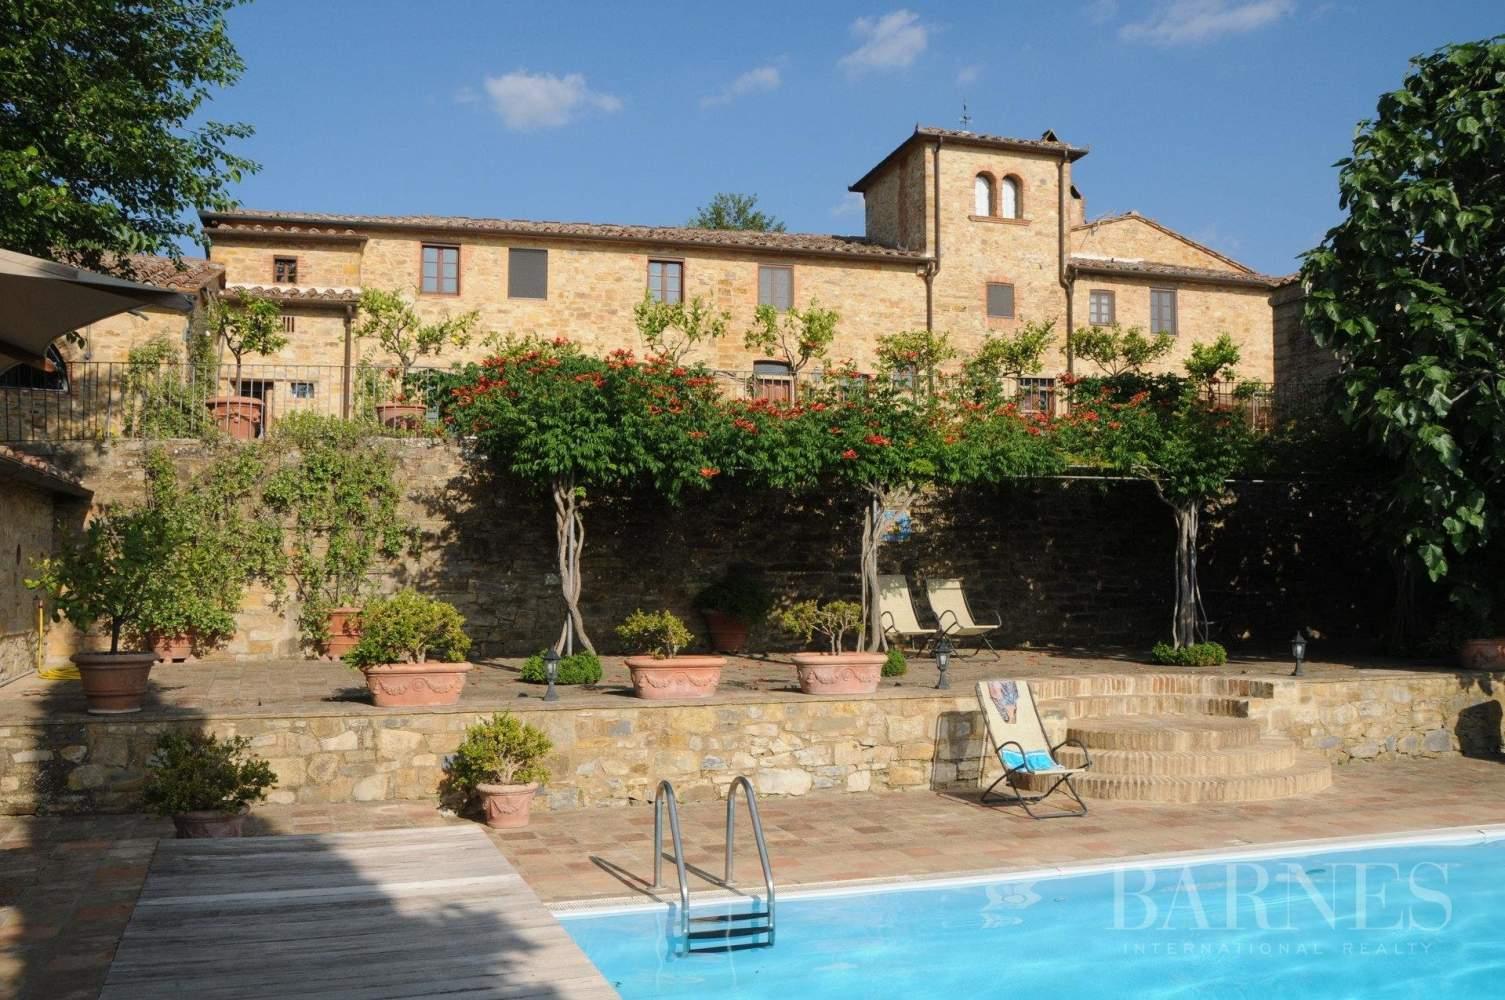 Barberino Tavarnelle  - Villa 10 Cuartos 9 Habitaciones - picture 5